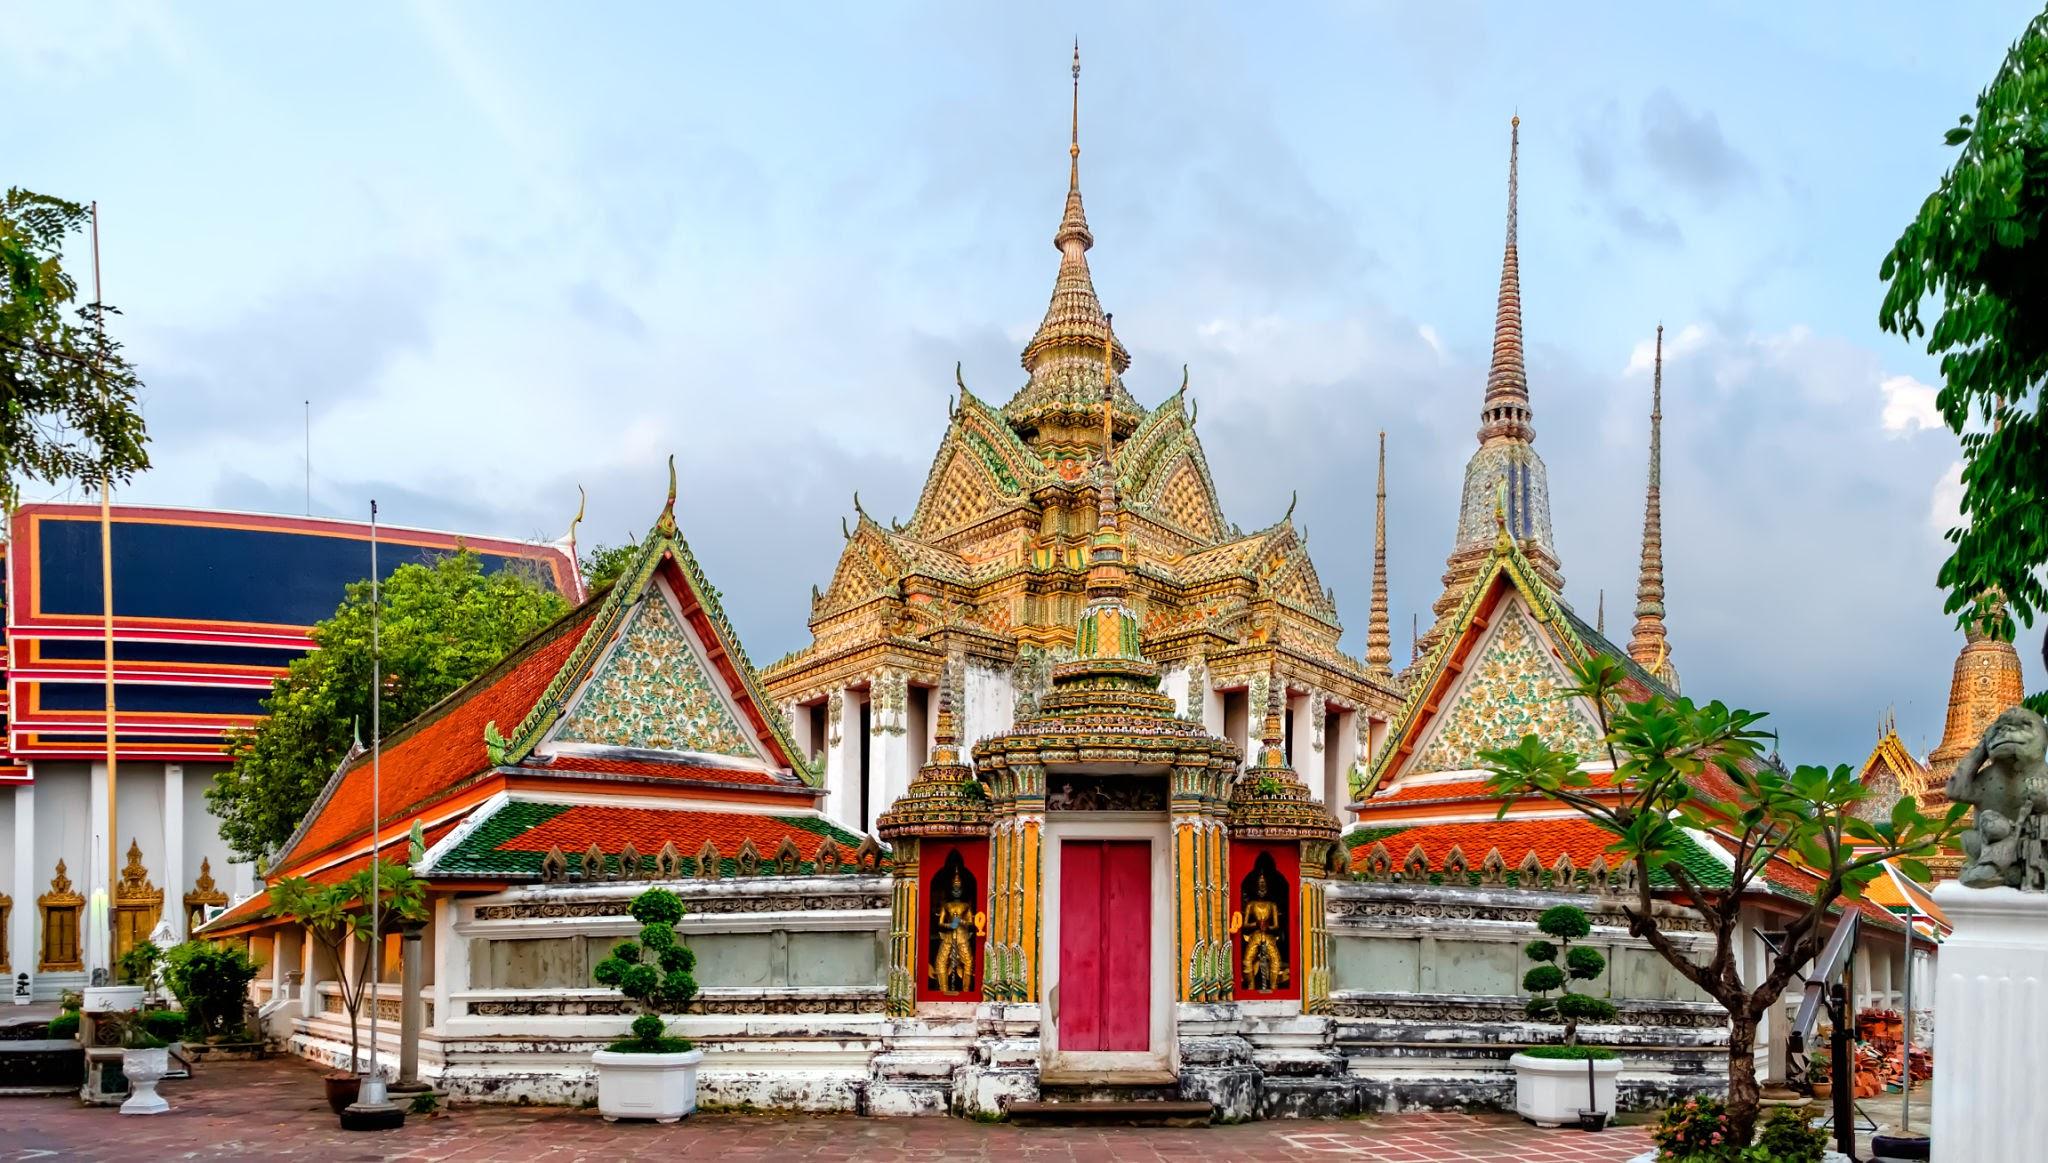 Wat Phra Chetuphon (Wat Pho - reclining Buddha)